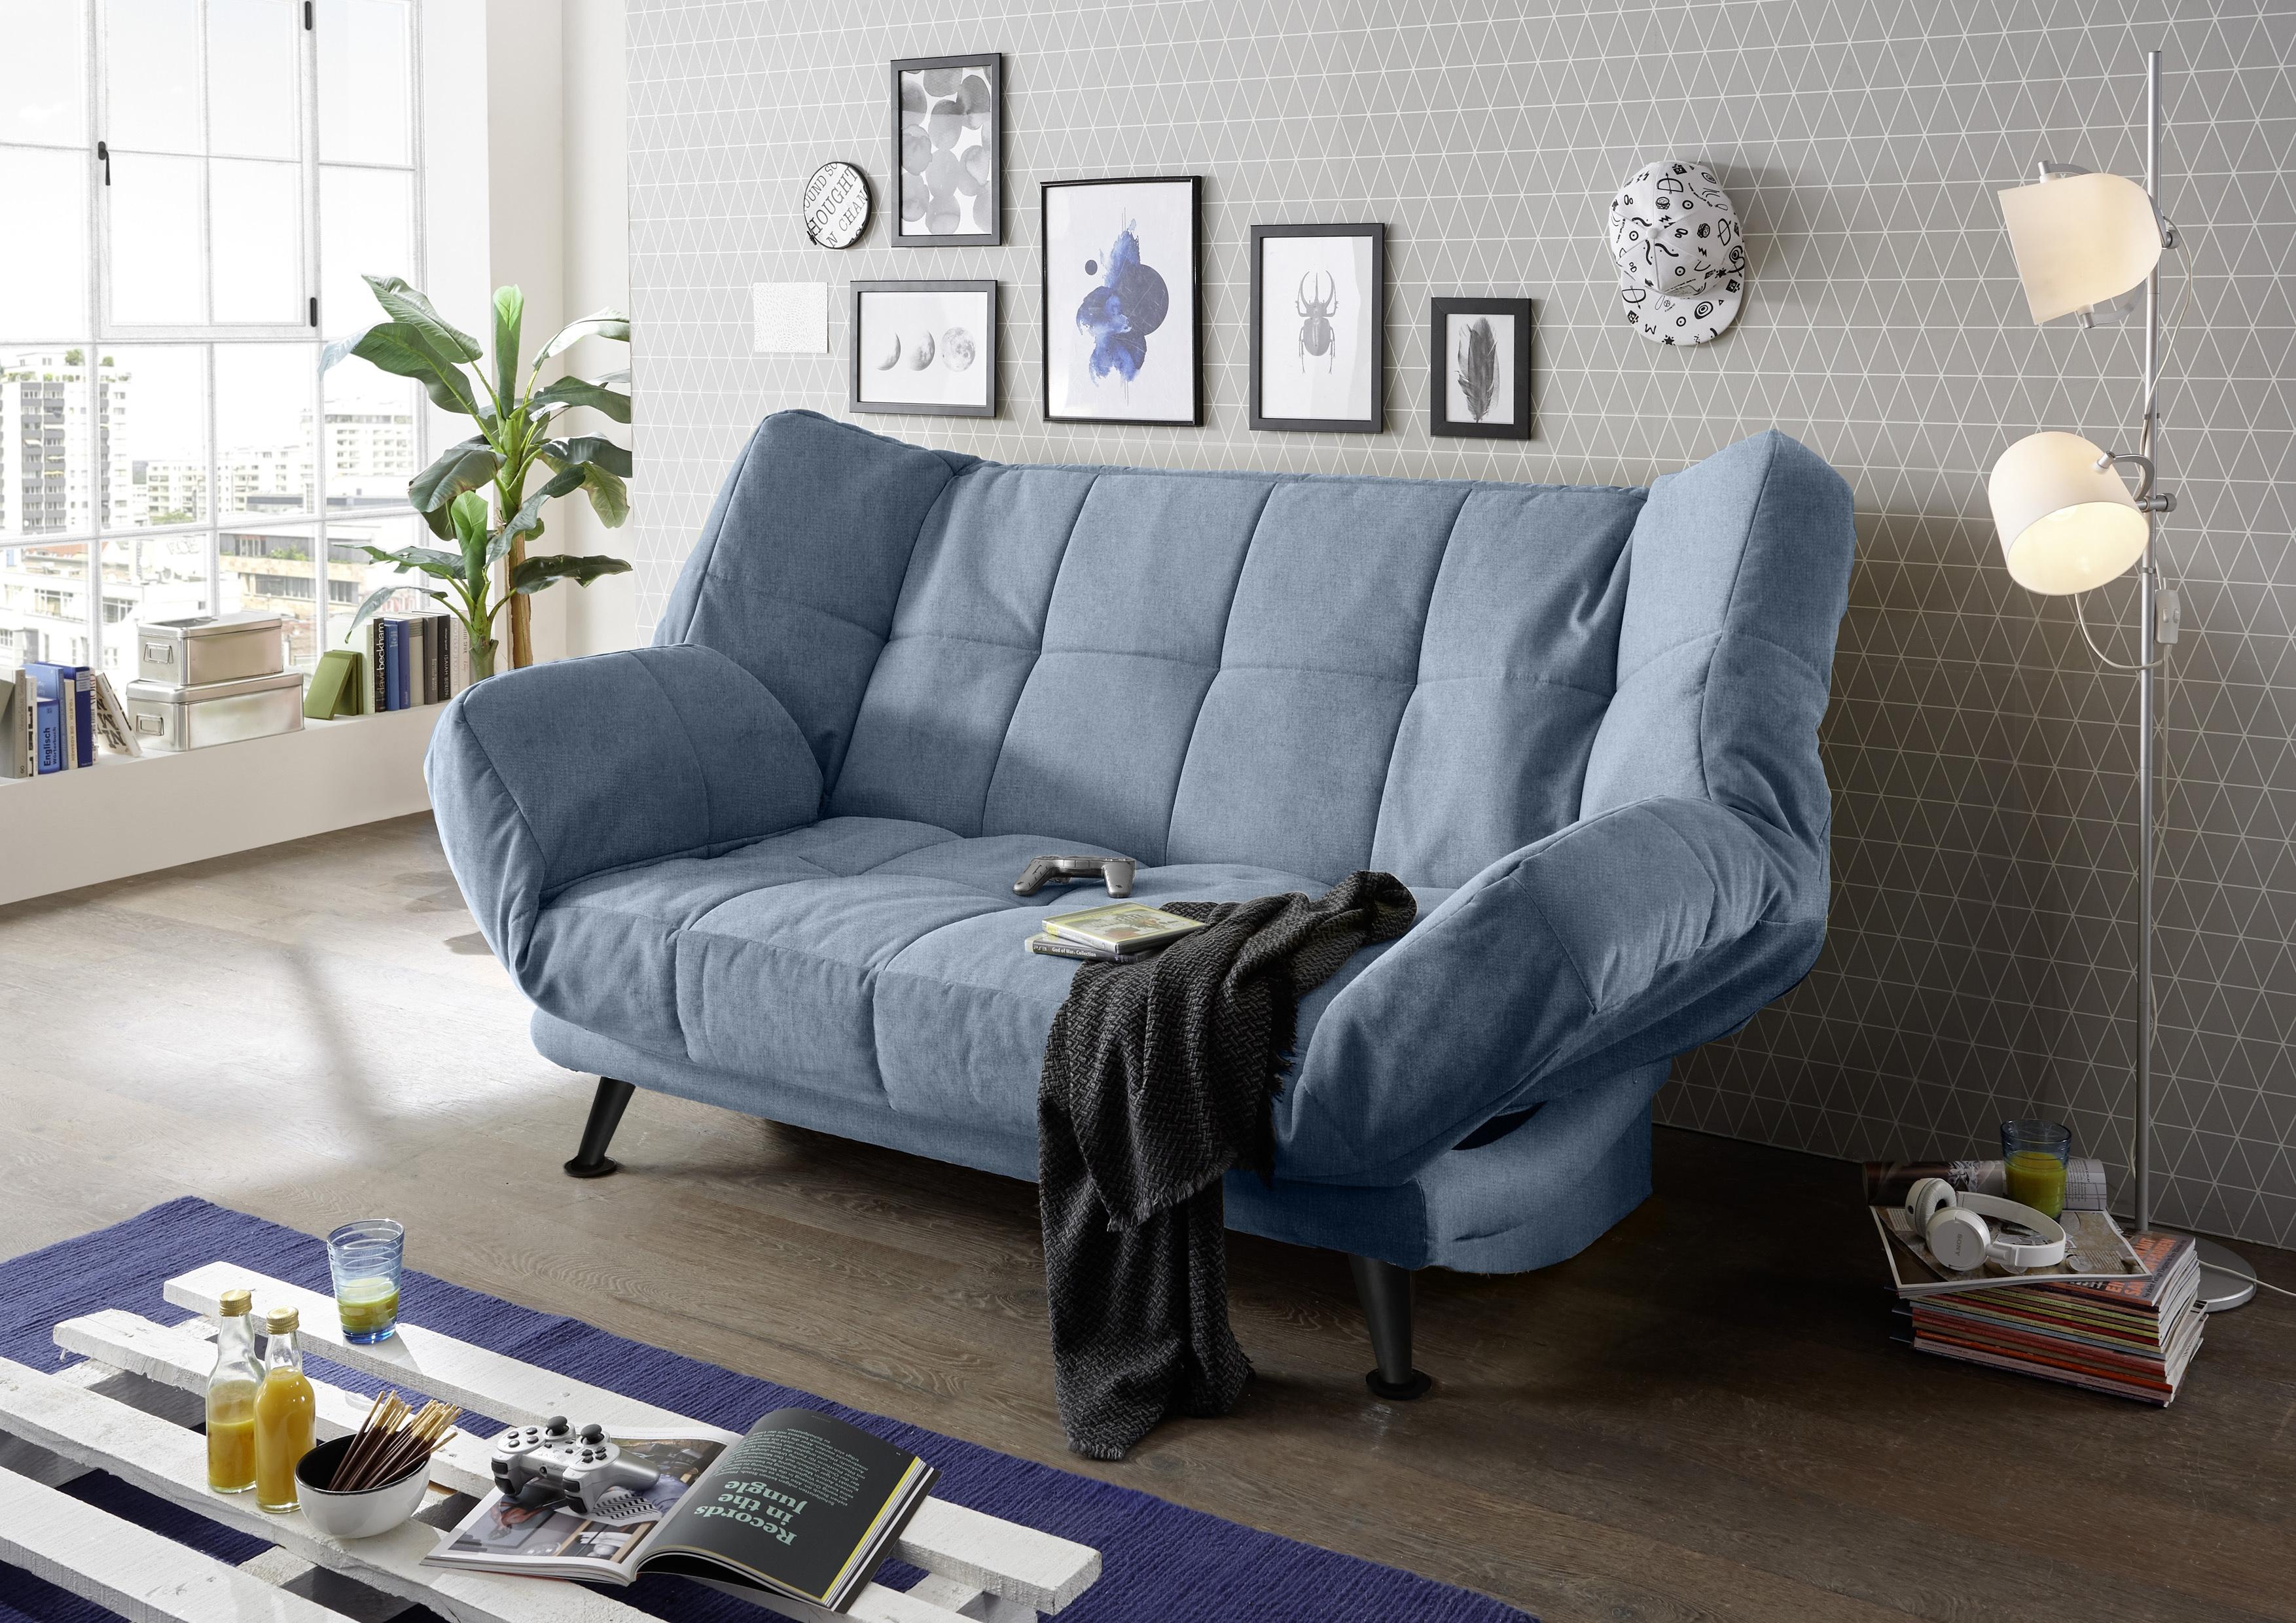 Canapea extensibila cu lada de depozitare, tapitata cu stofa, 3 locuri Ikaris 2 Albastru, l208xA98xH102 cm